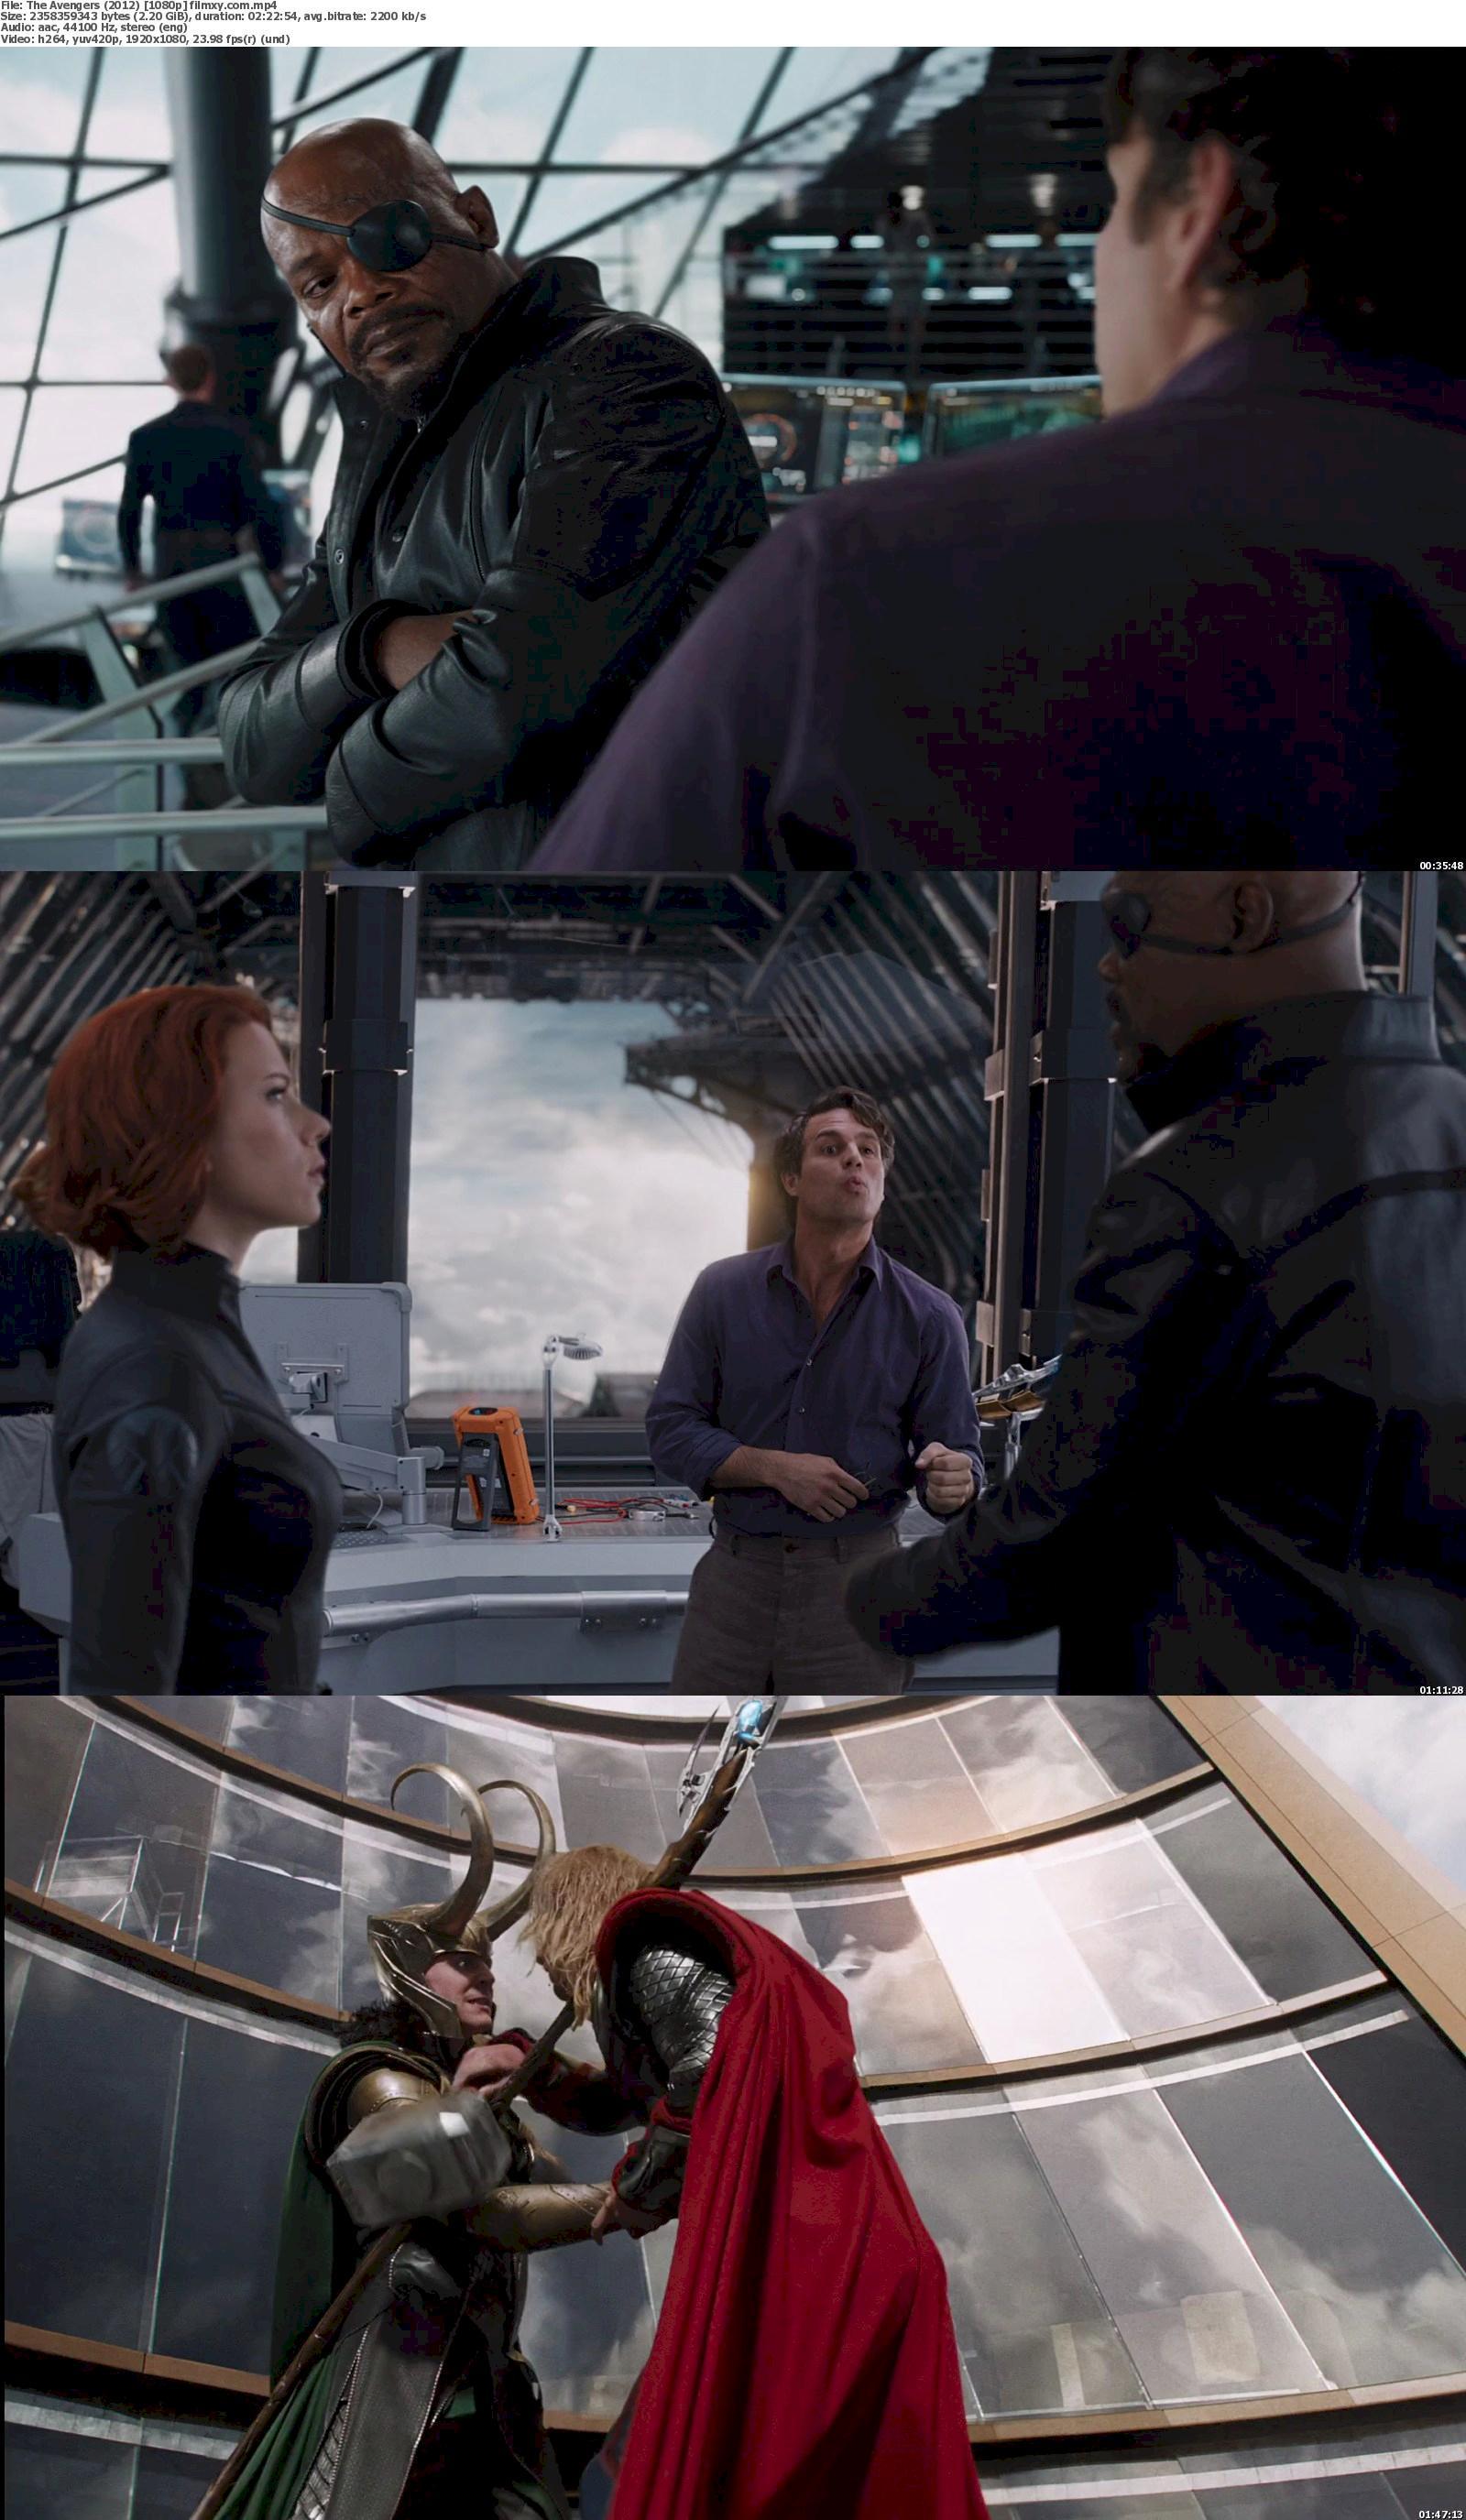 Watch The Avengers (2012) Full Movie On Filmxy